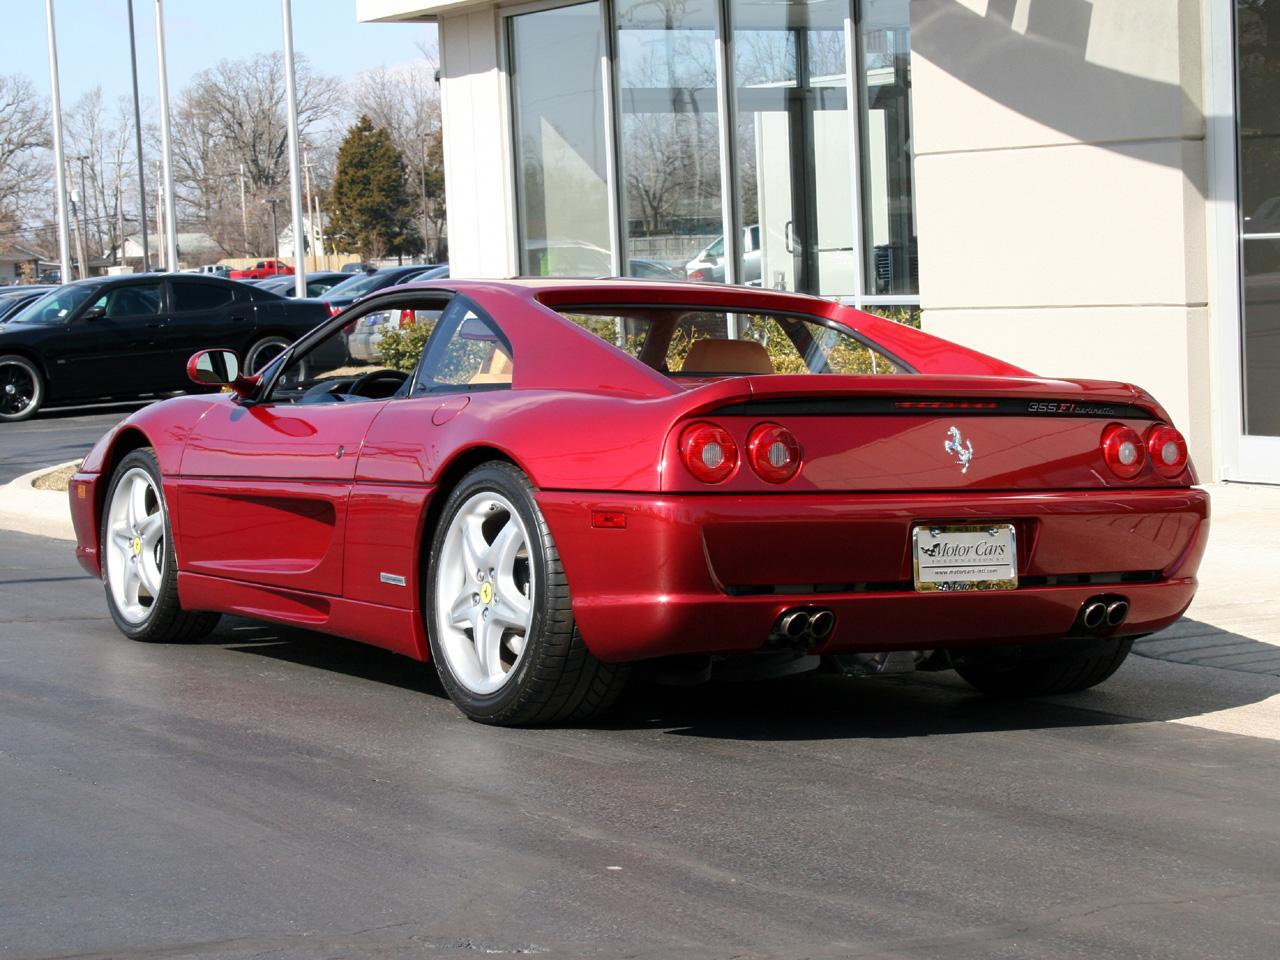 Ferrari Luxury Model Cars 30 Cool Car Hd Wallpaper